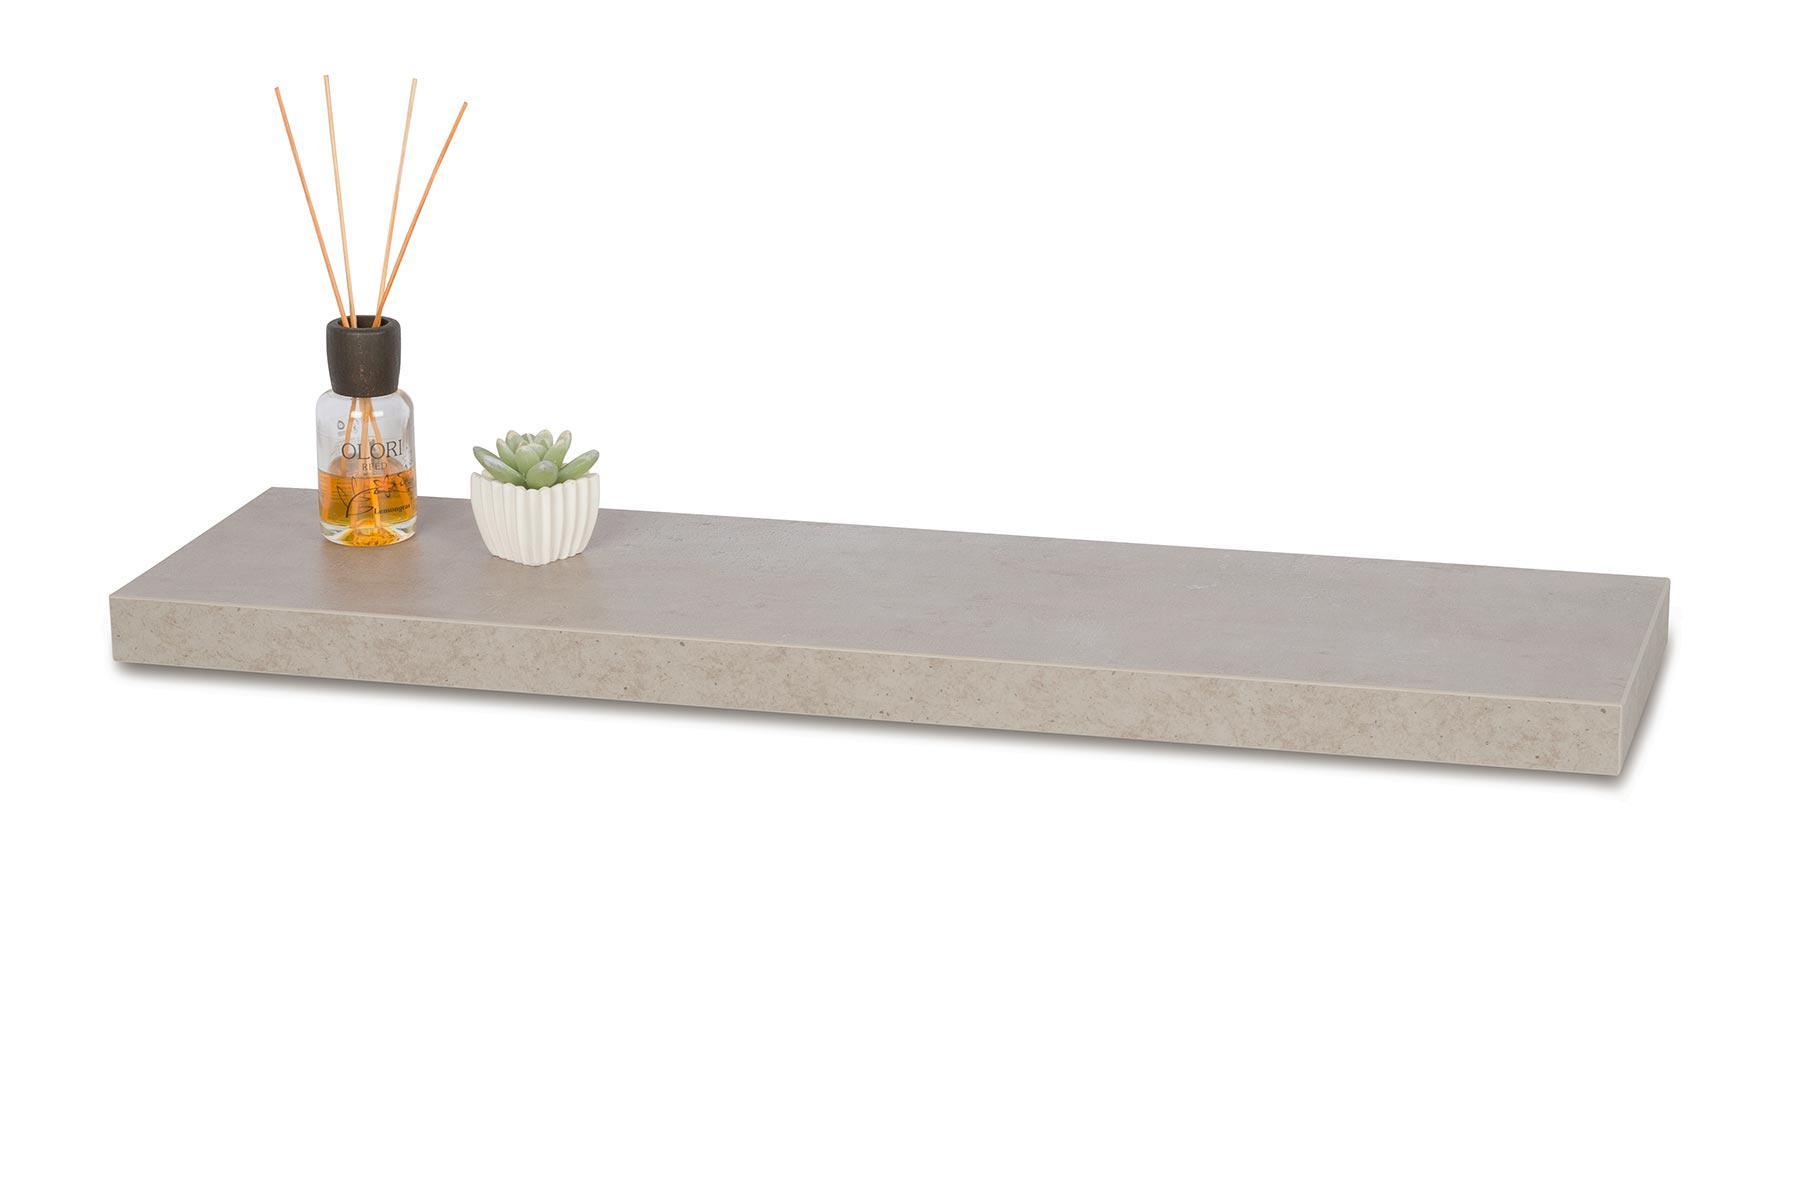 wandboard grau interesting hat alles platz in diesem unlasierten wandboard in naturgrau mit. Black Bedroom Furniture Sets. Home Design Ideas